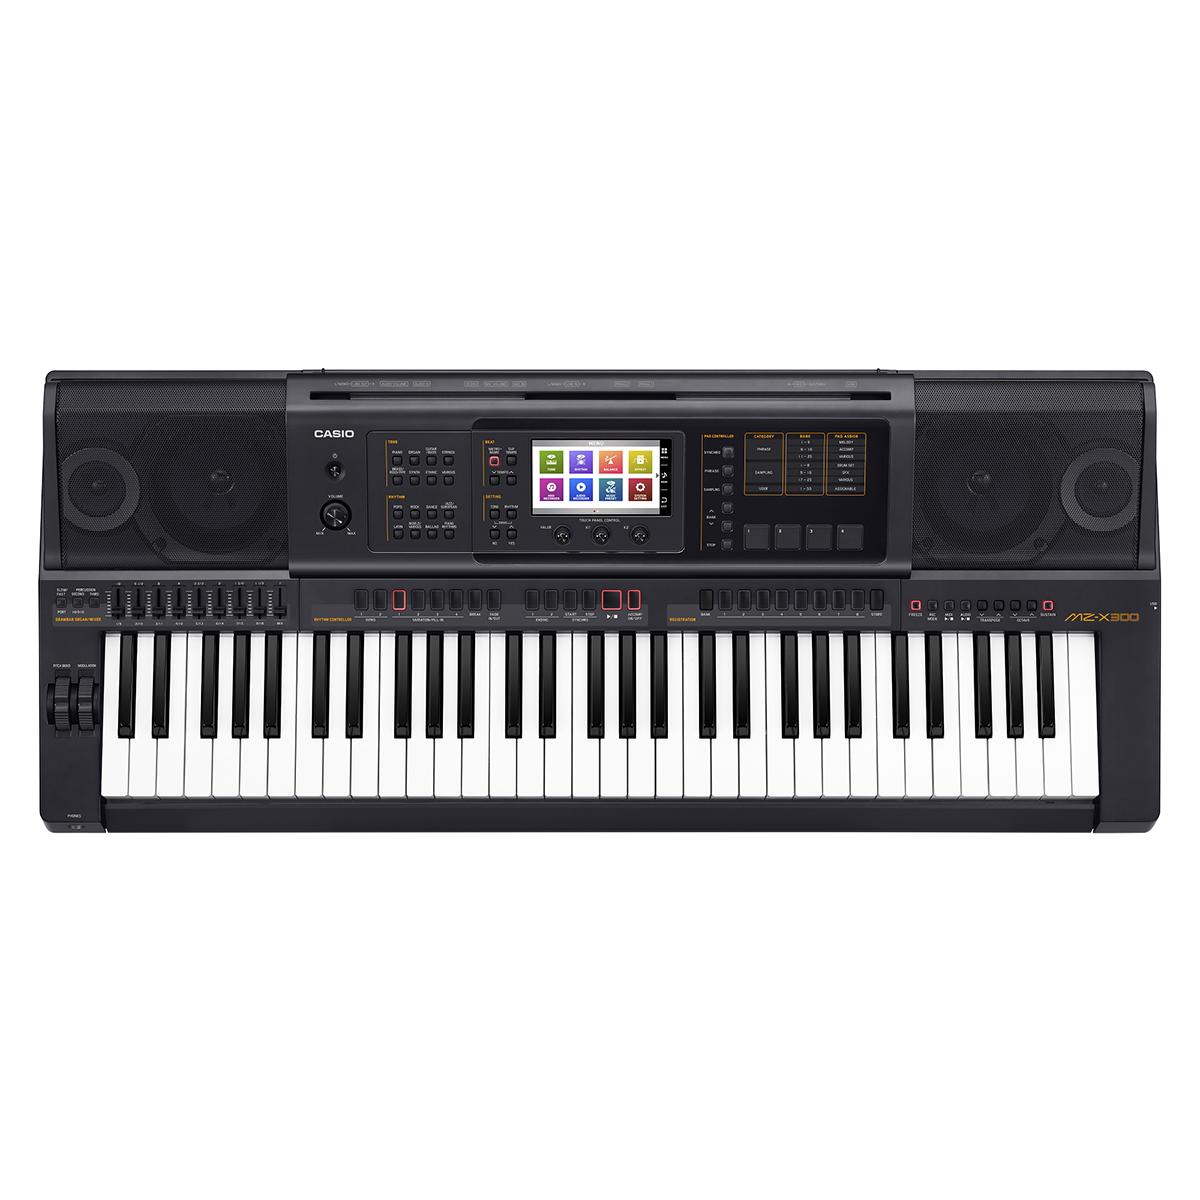 Billede af Casio MZ-X300 keyboard sort